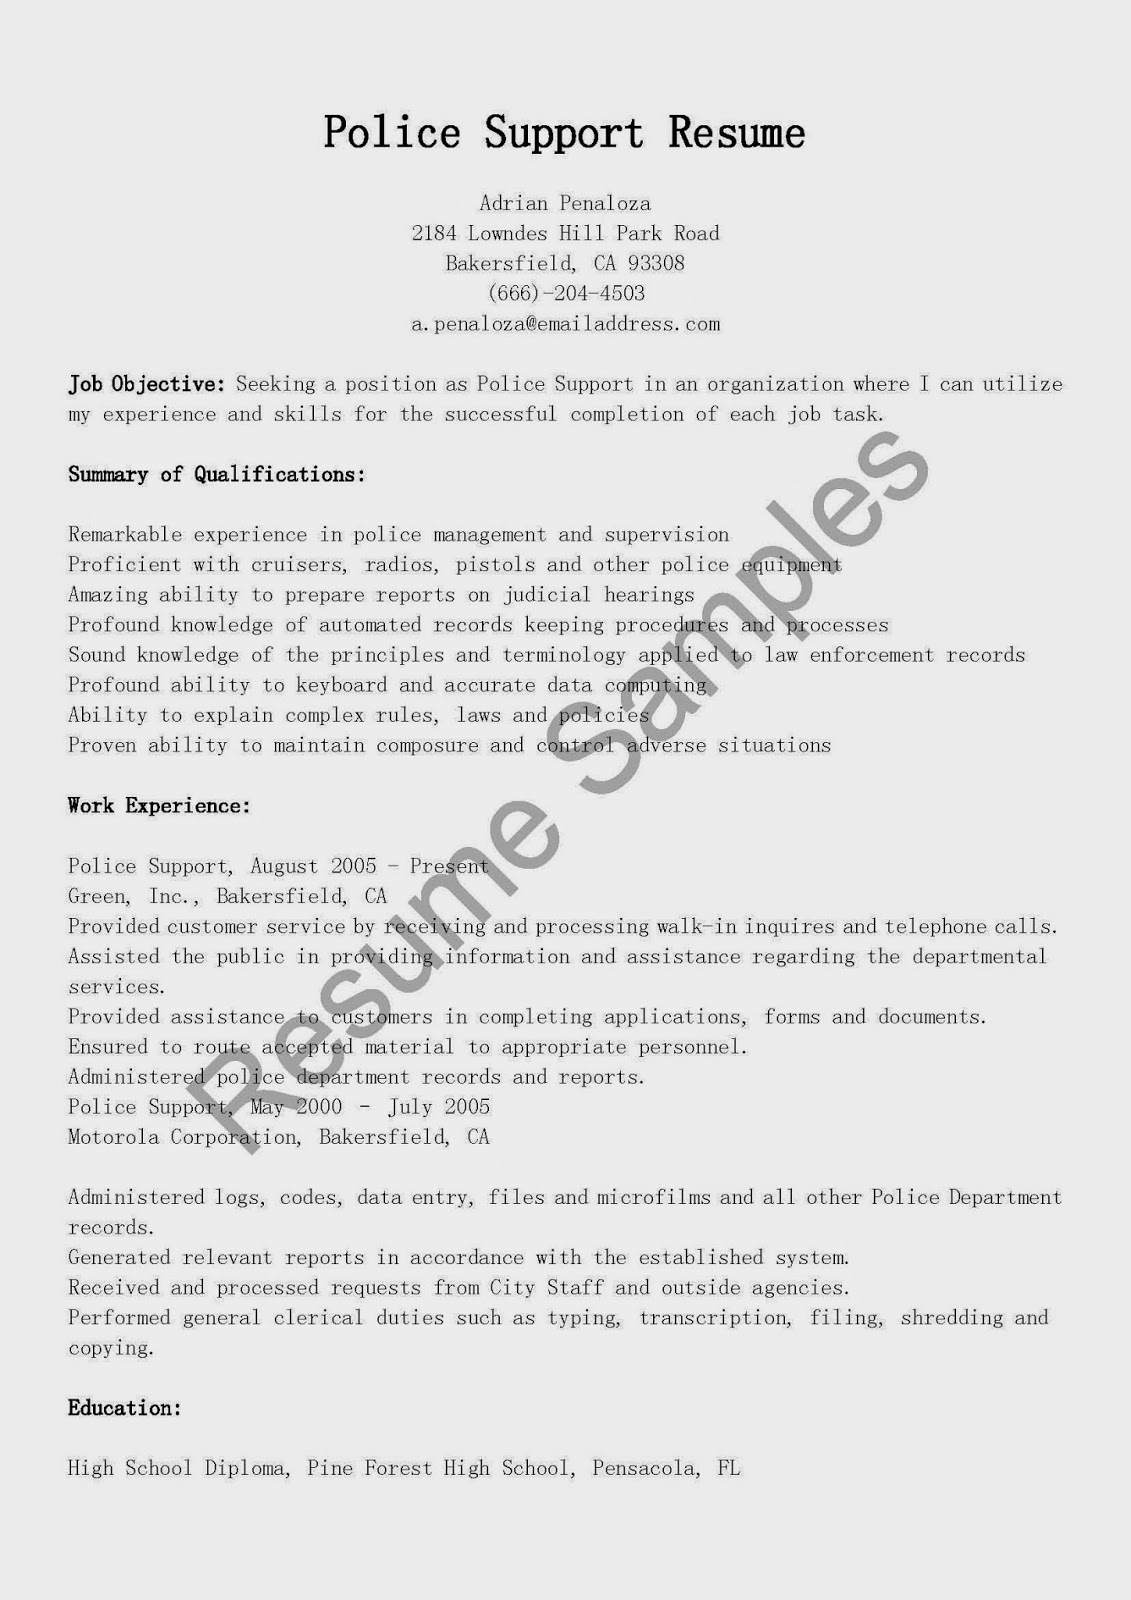 Resume Samples Police Support Resume Sample